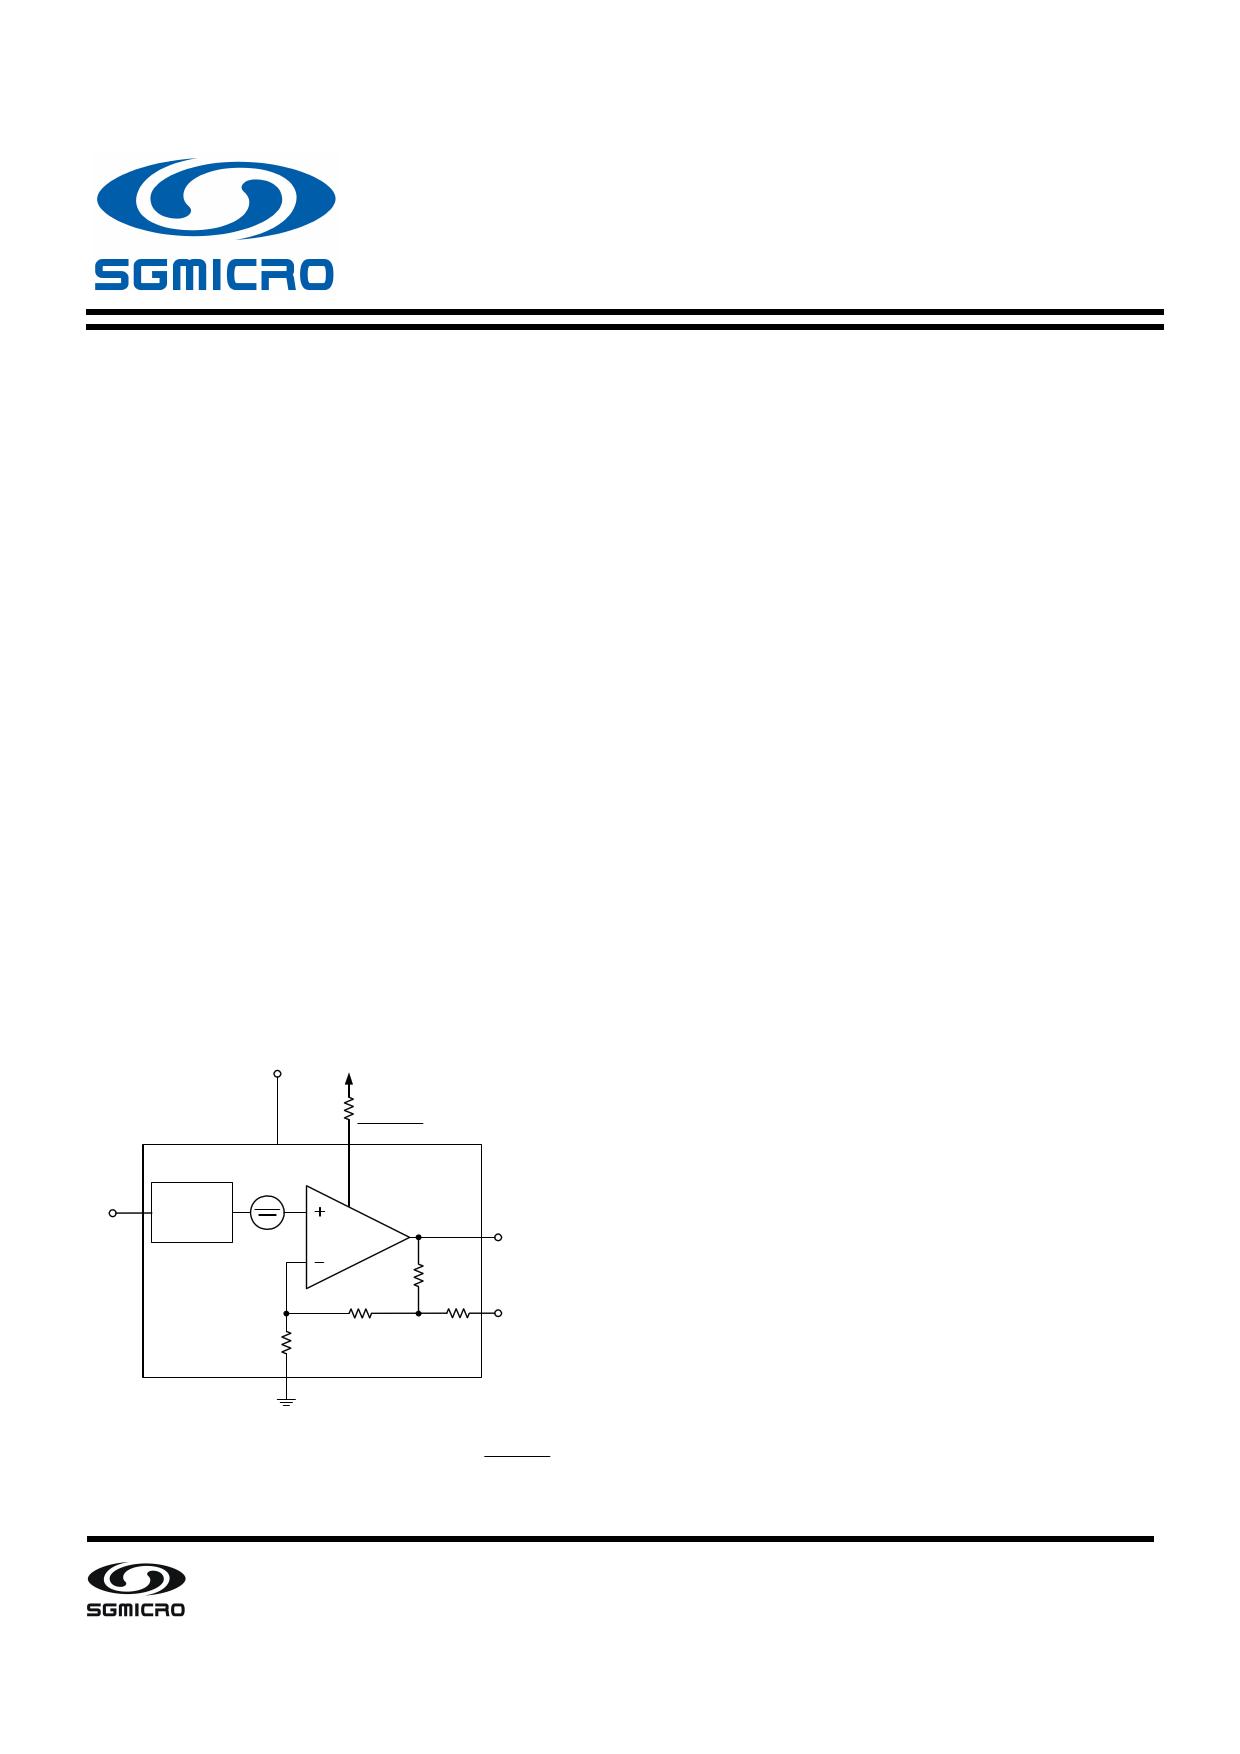 SGM9114 datasheet, circuit